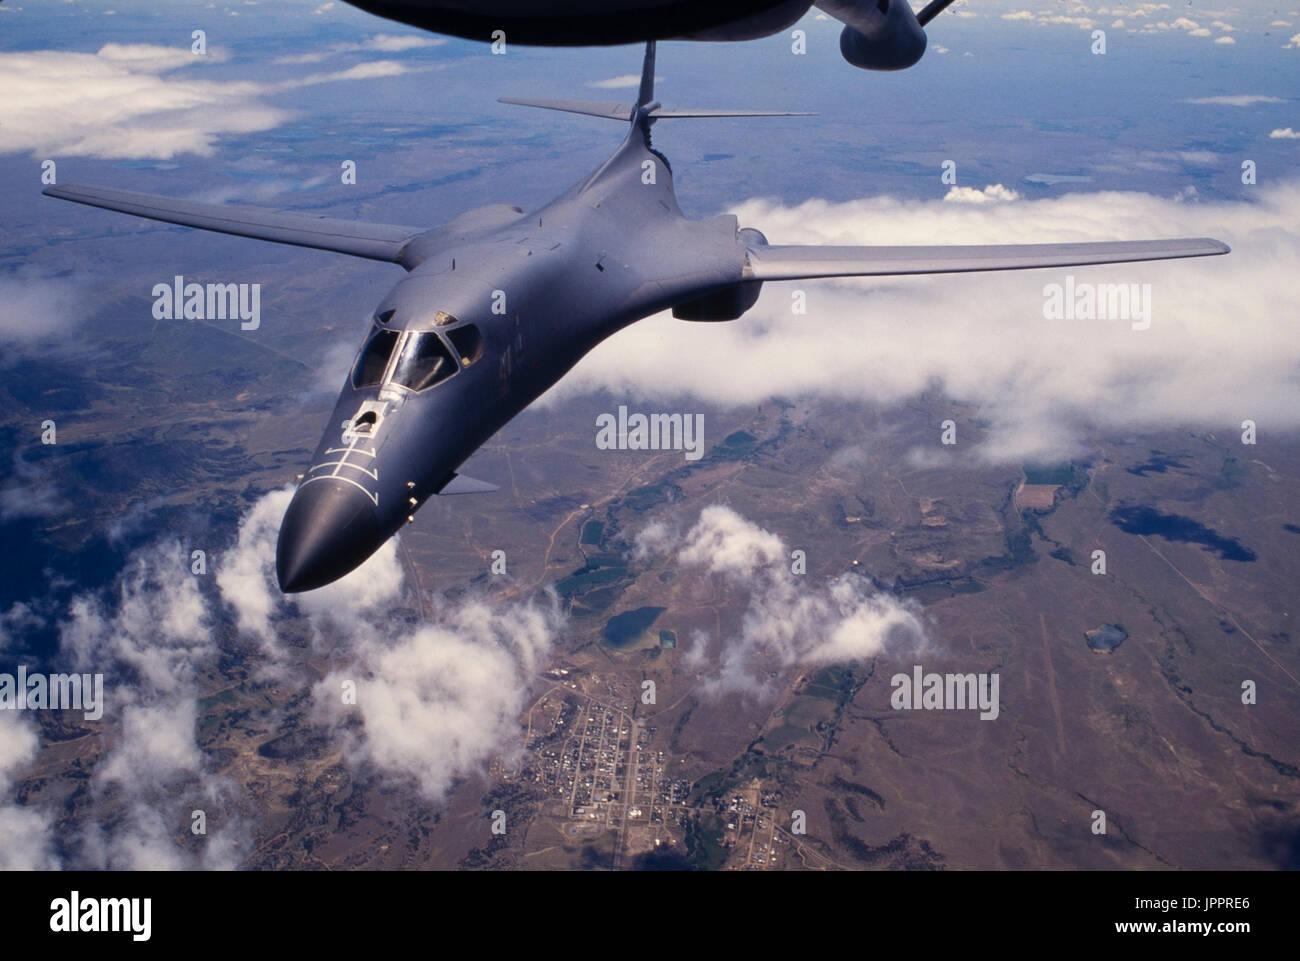 B1 Lancer Supersonic Bomber Stock Photos & B1 Lancer ... B1 Lancer Supersonic